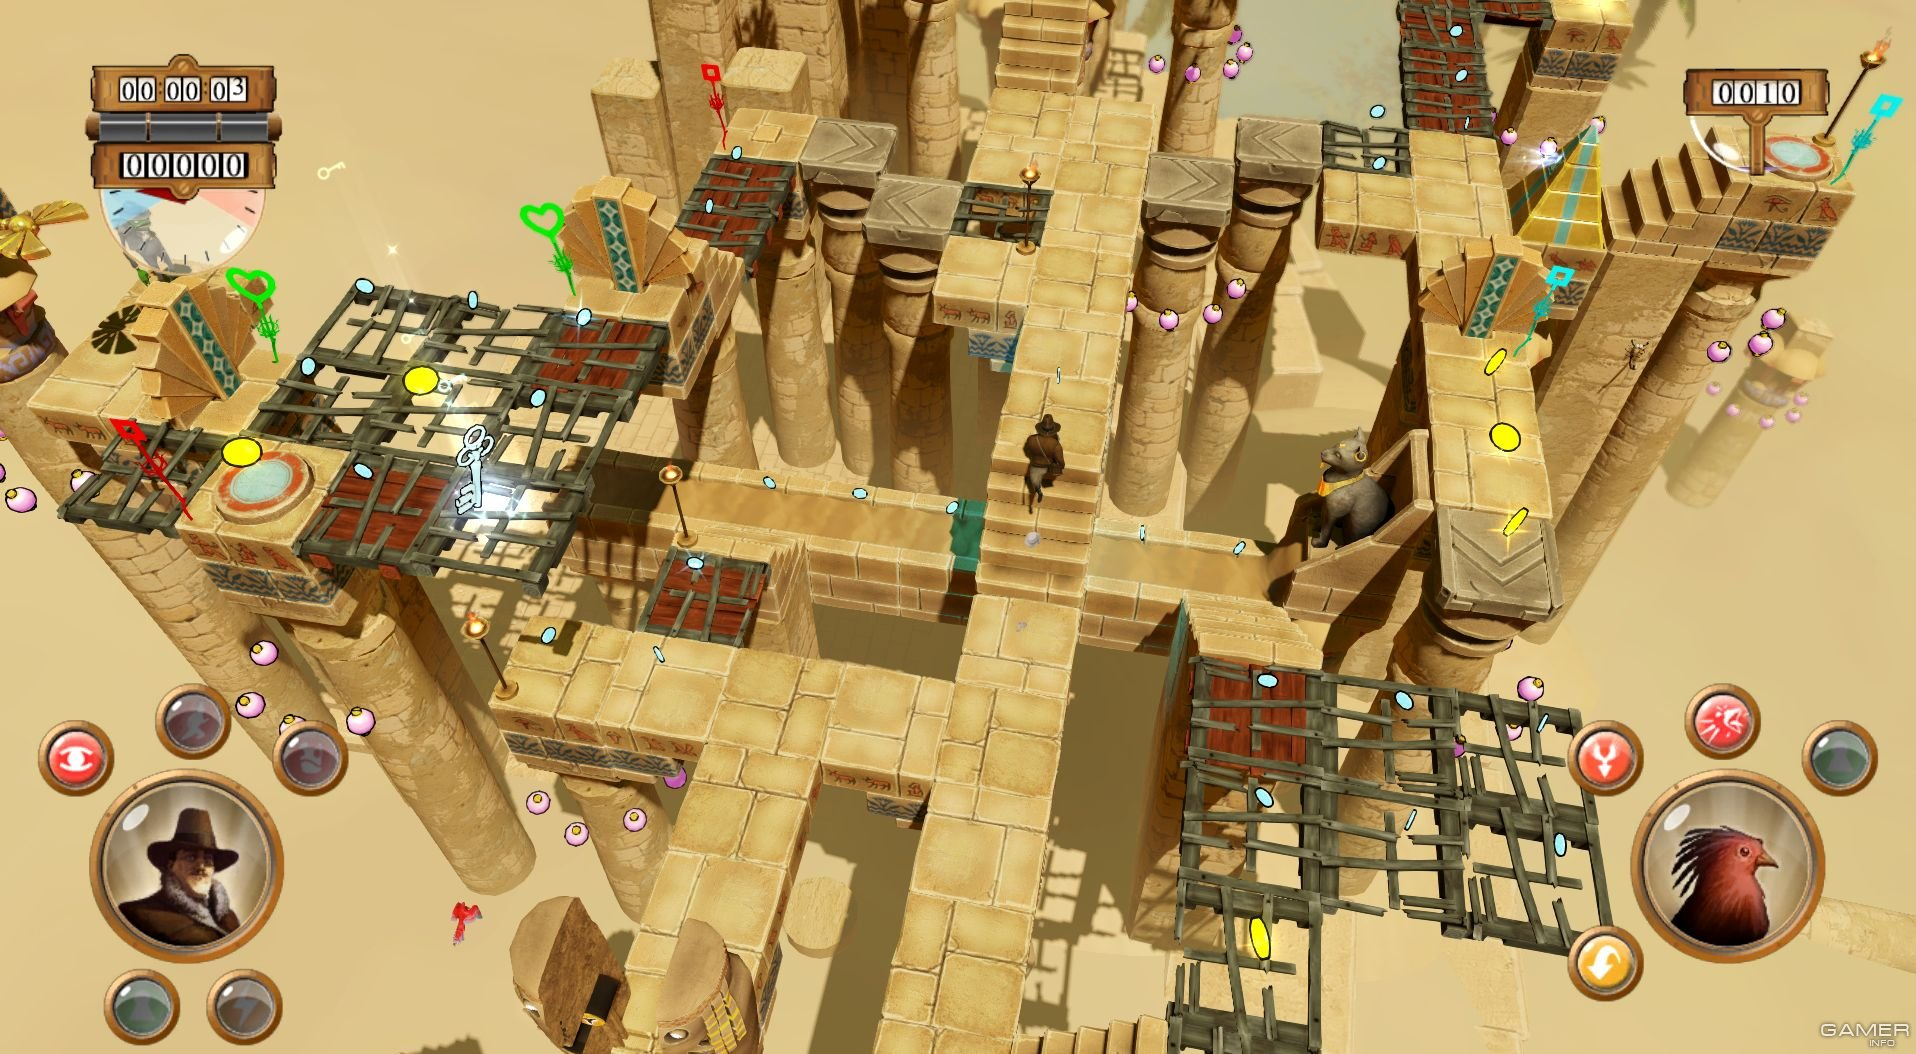 Hamiltons great adventure - pc game - download mf, mu